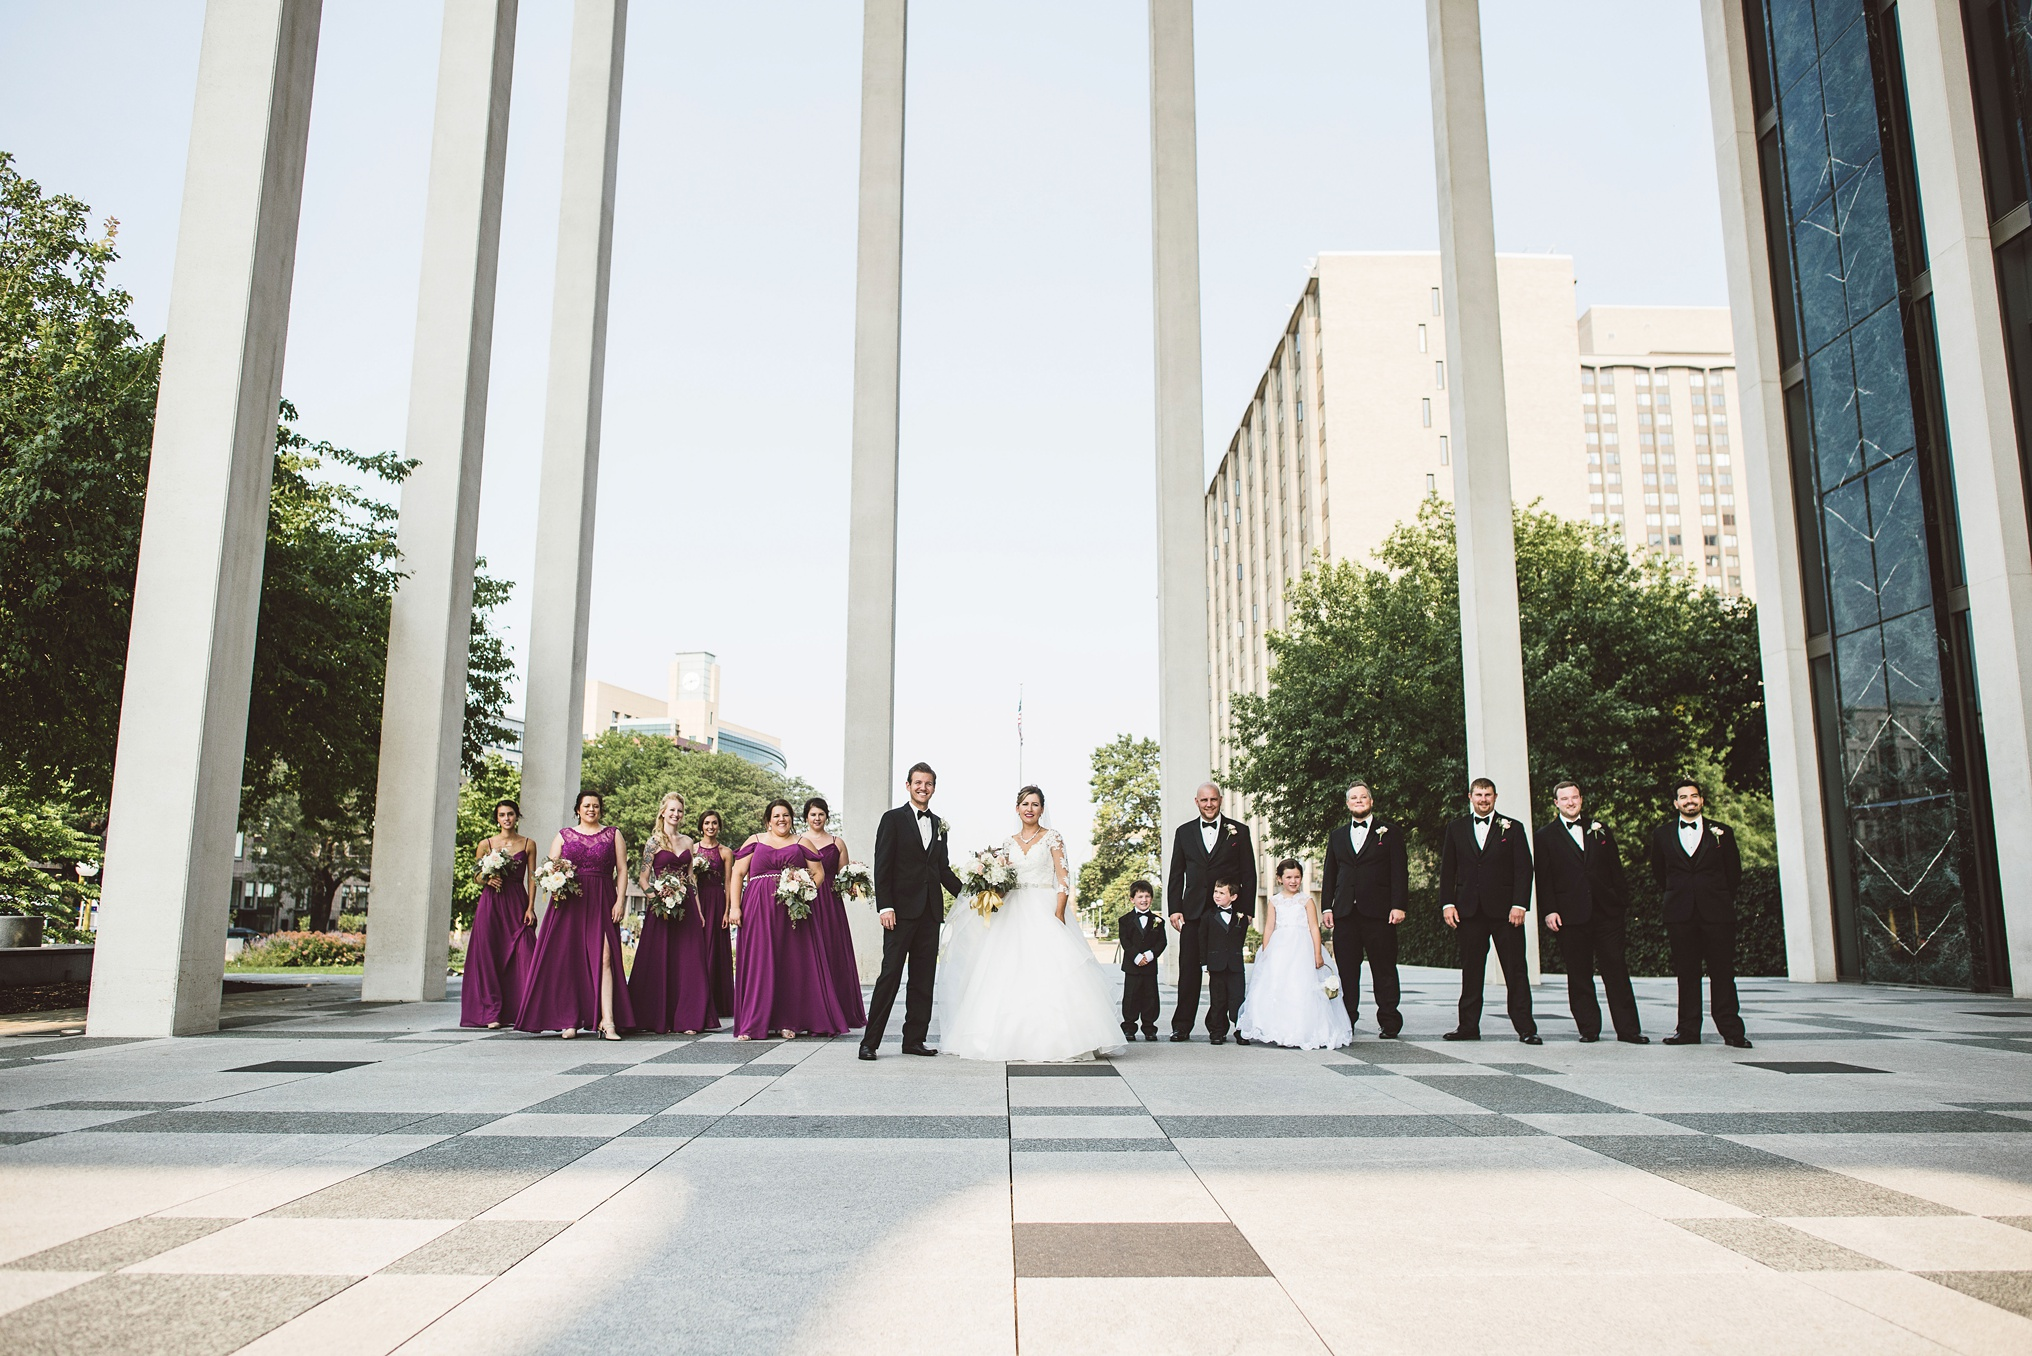 best_wedding_photography_2017_by_lucas_botz_photography_207.jpg